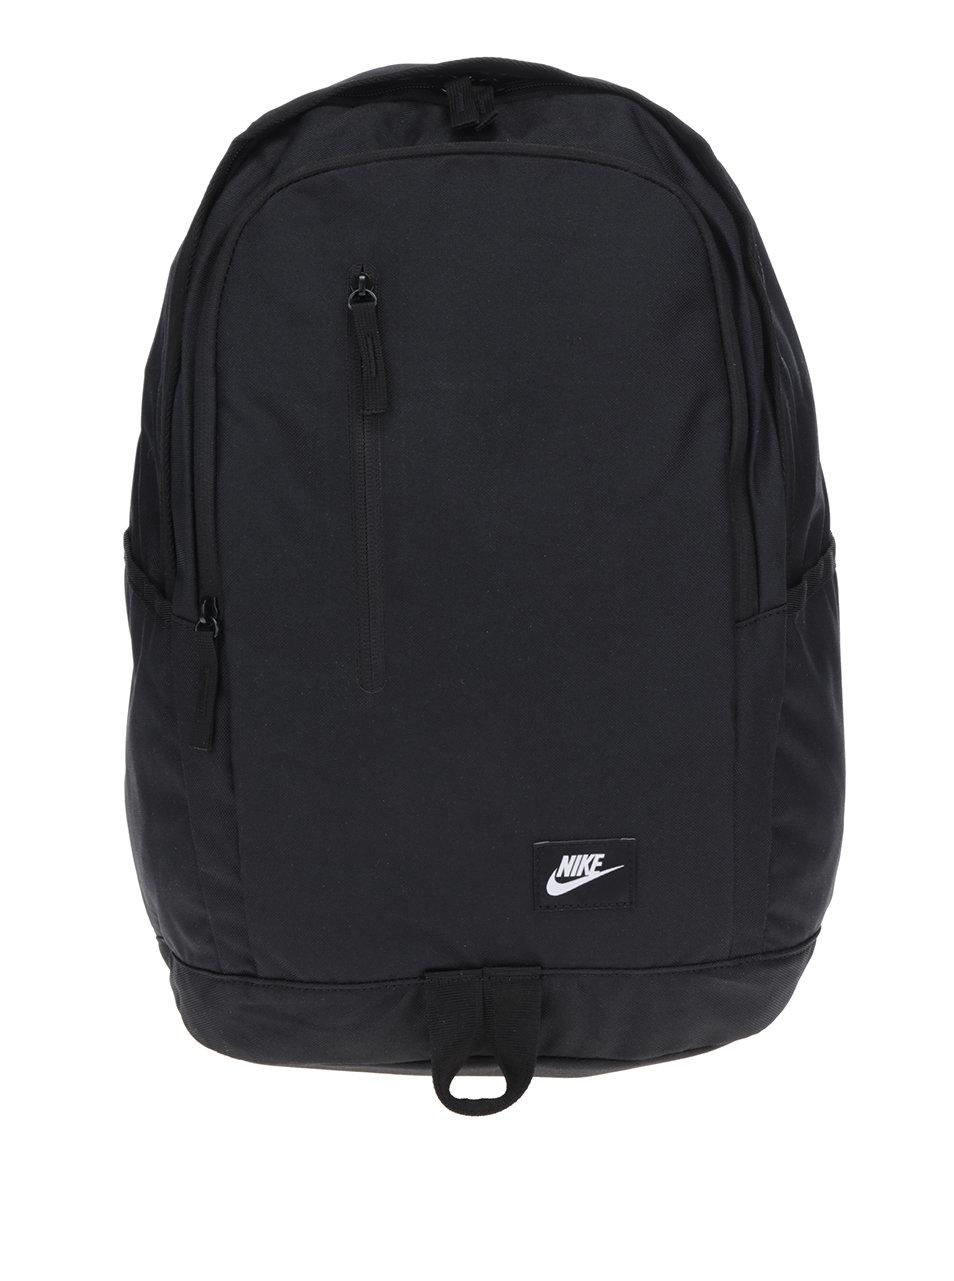 Černý pánský batoh Nike Soleday ... f55b2d0ced